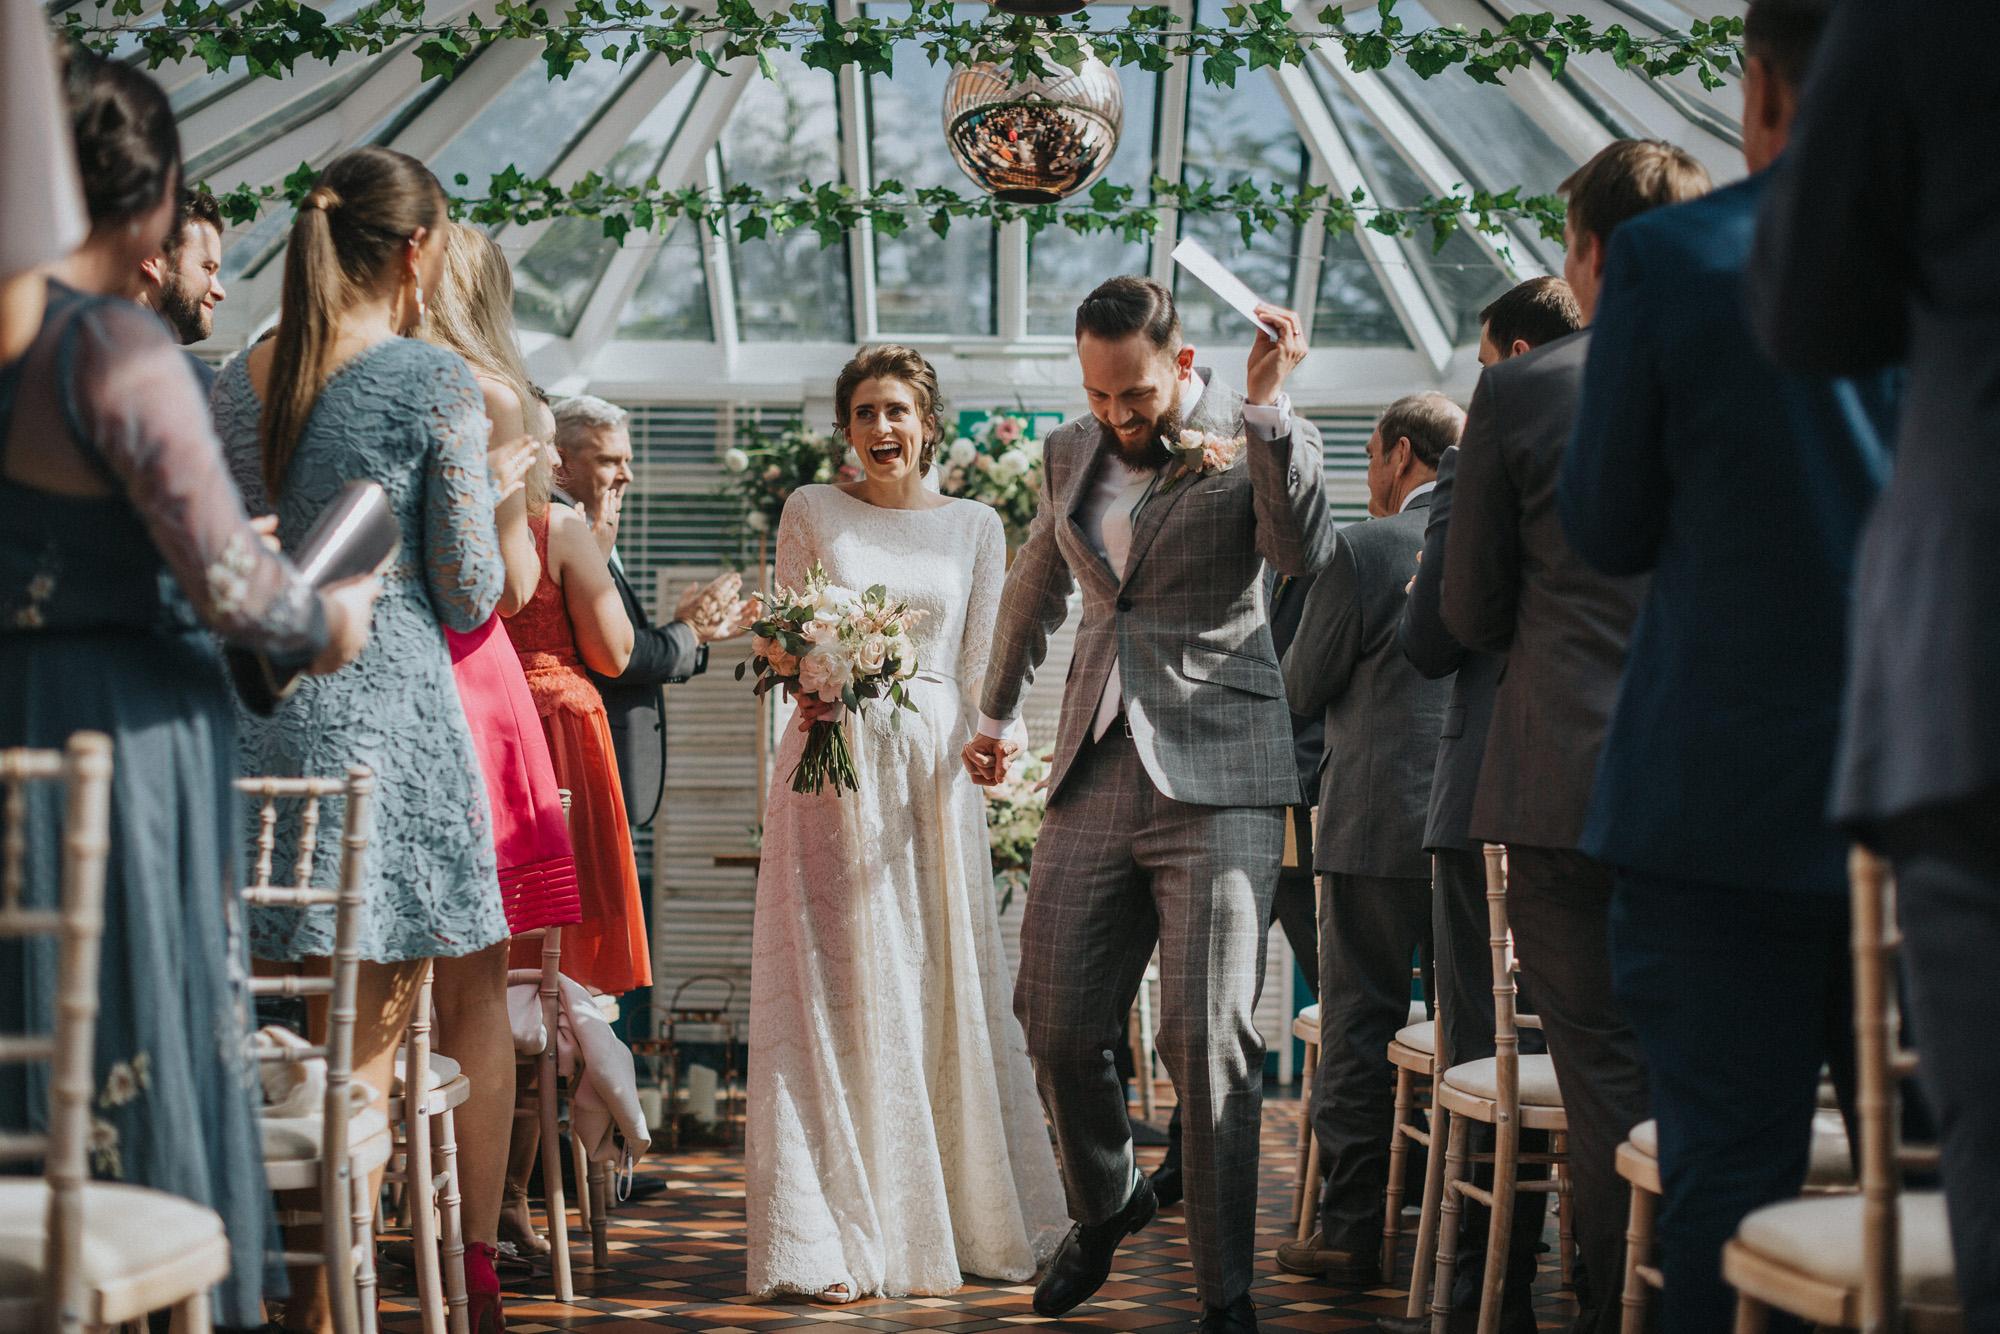 Kate-Beaumont-Lace-Flared-Dahlia-Gown-Leeds-Wedding-Bloom-Weddings-26.jpg